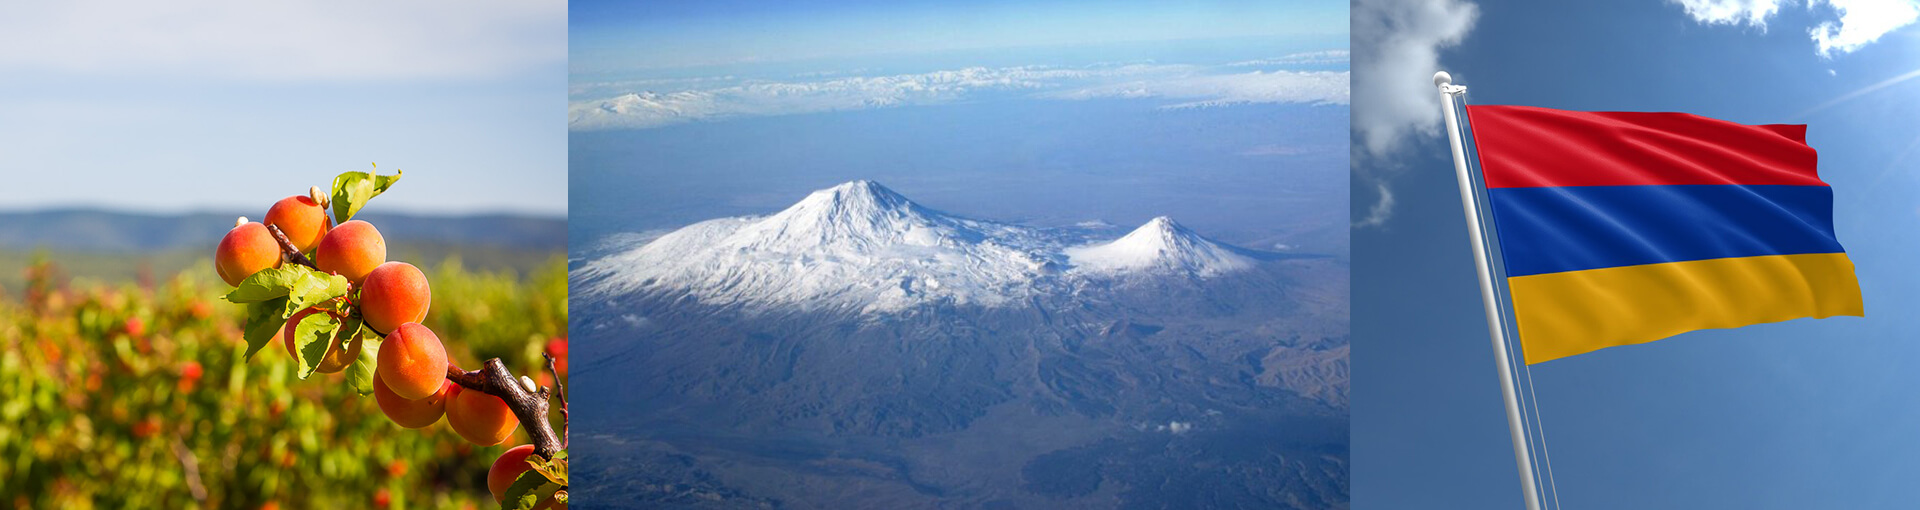 The symbols of Armenia